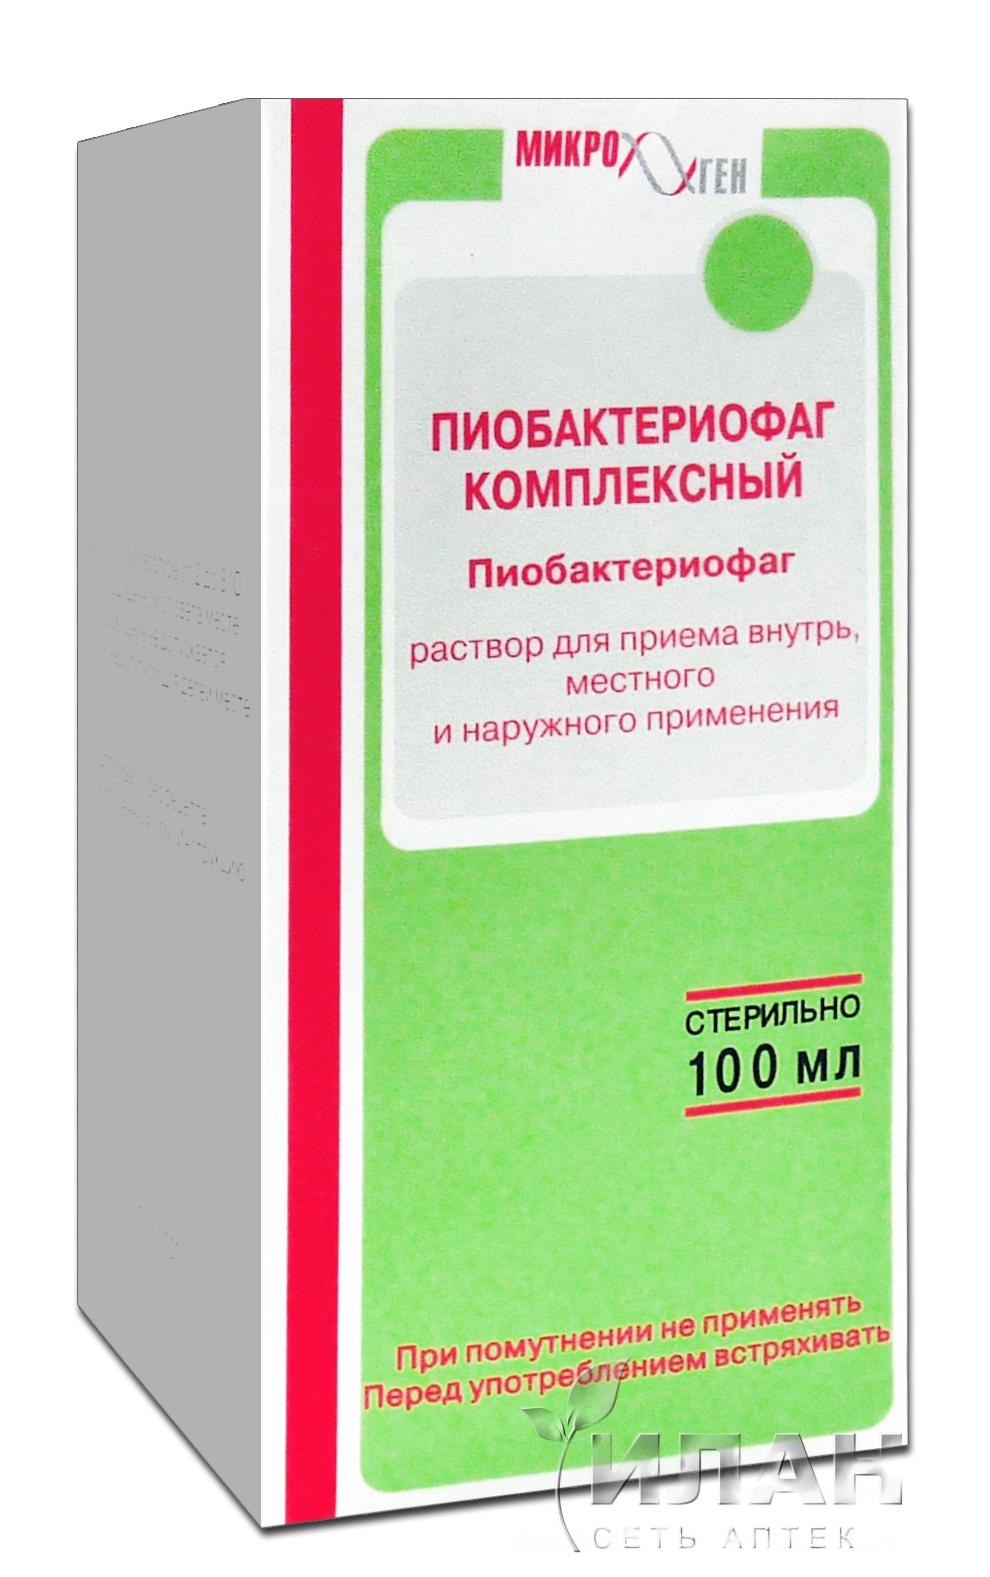 bakteriofag-zhidkiy-polivalentniy-sekstafag